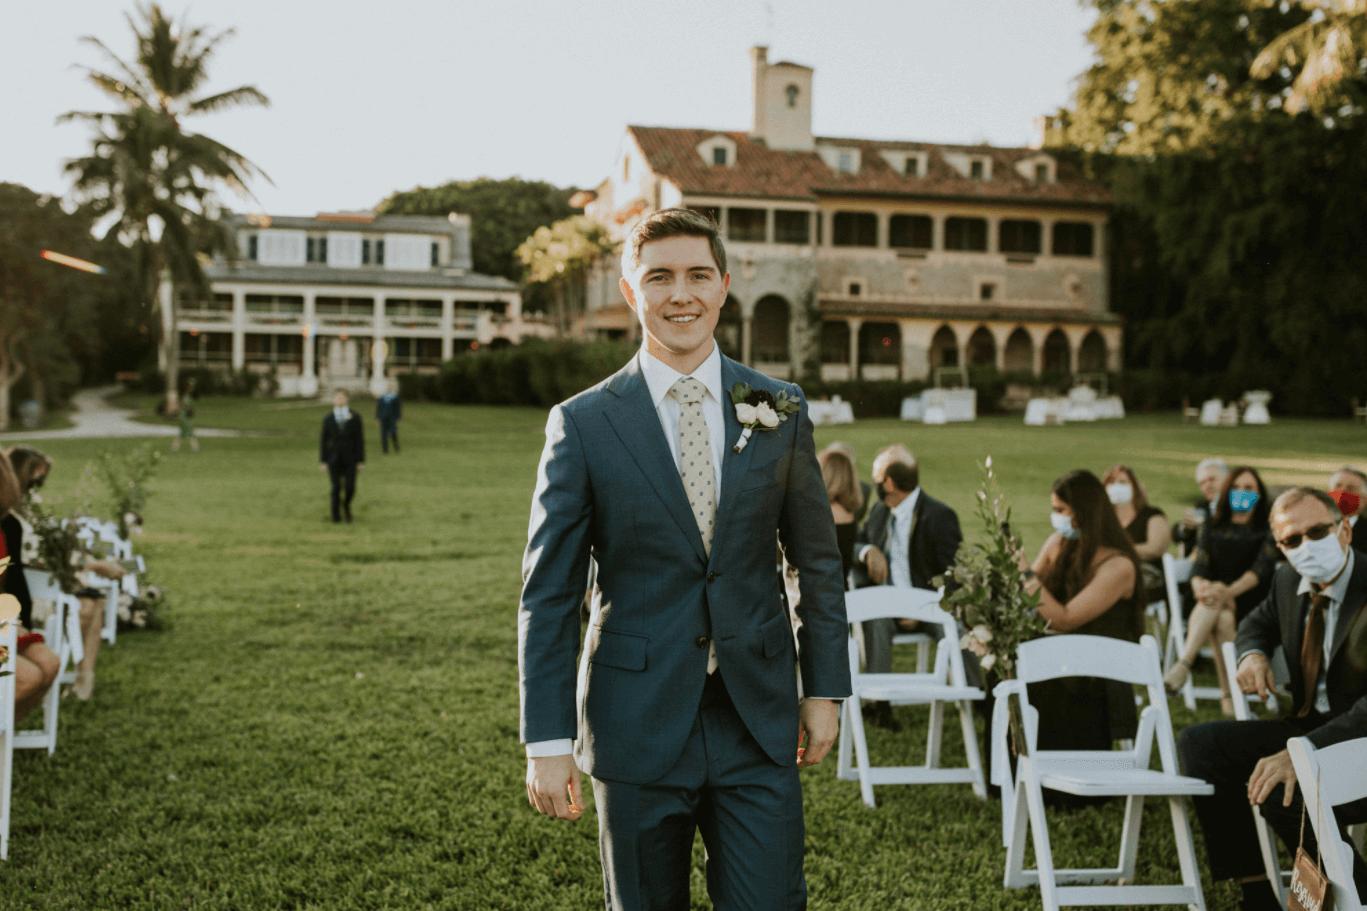 groom at historic deering estate wedding venue in miami, fl